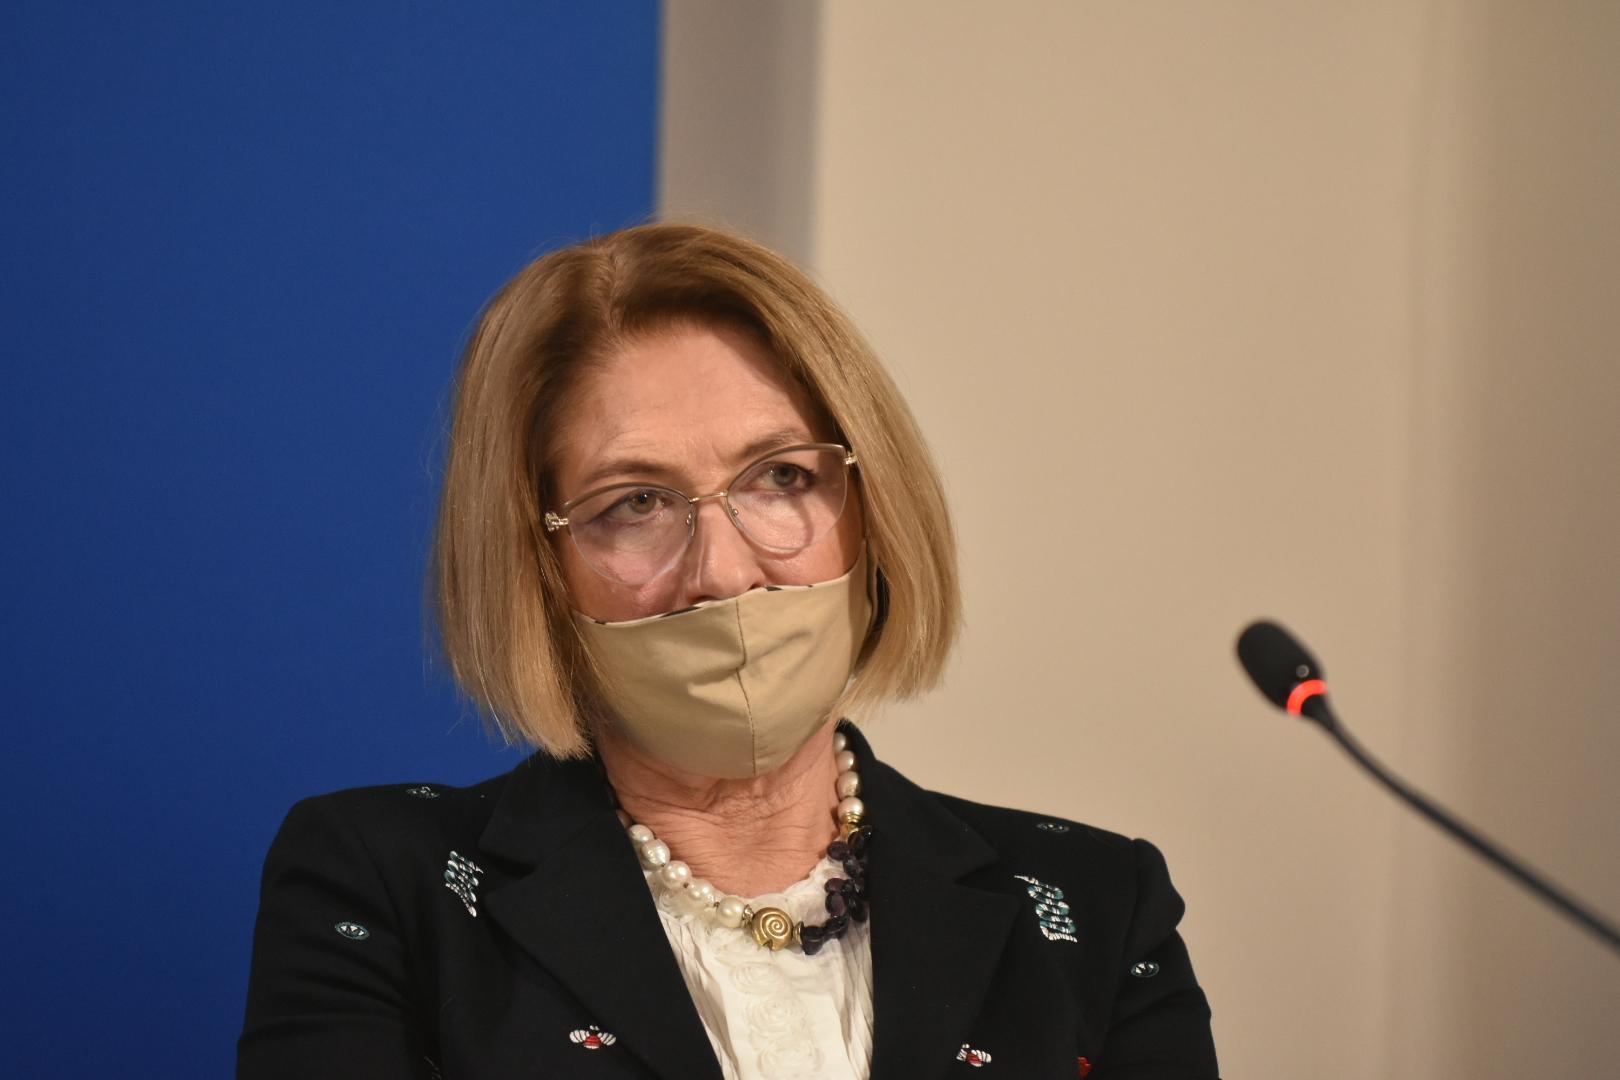 Profesor Iwona Mozer-Lisewska  - Wojtek Wardejn